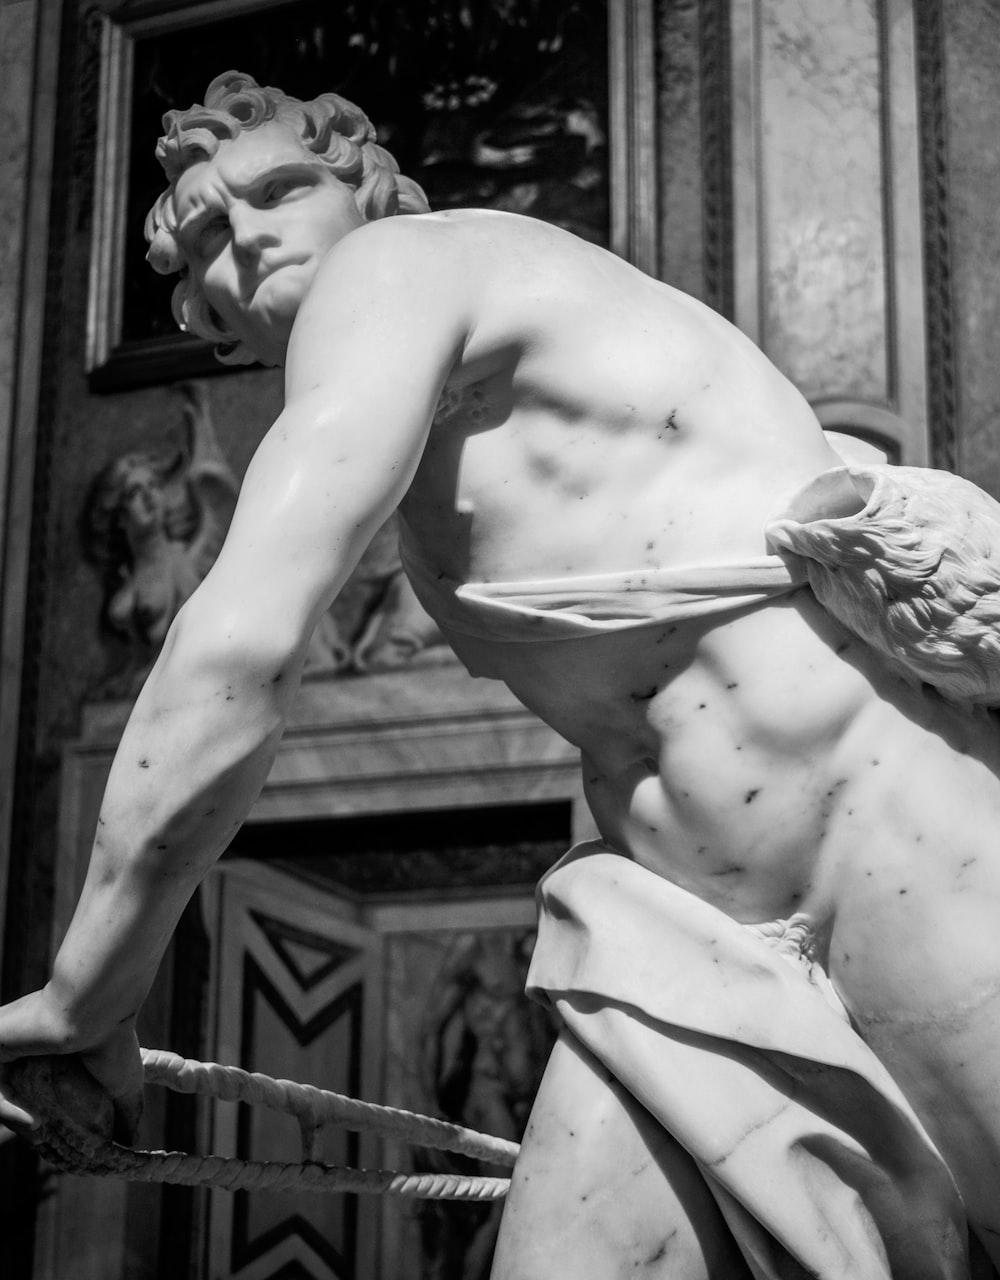 white concrete man statue close-up photography